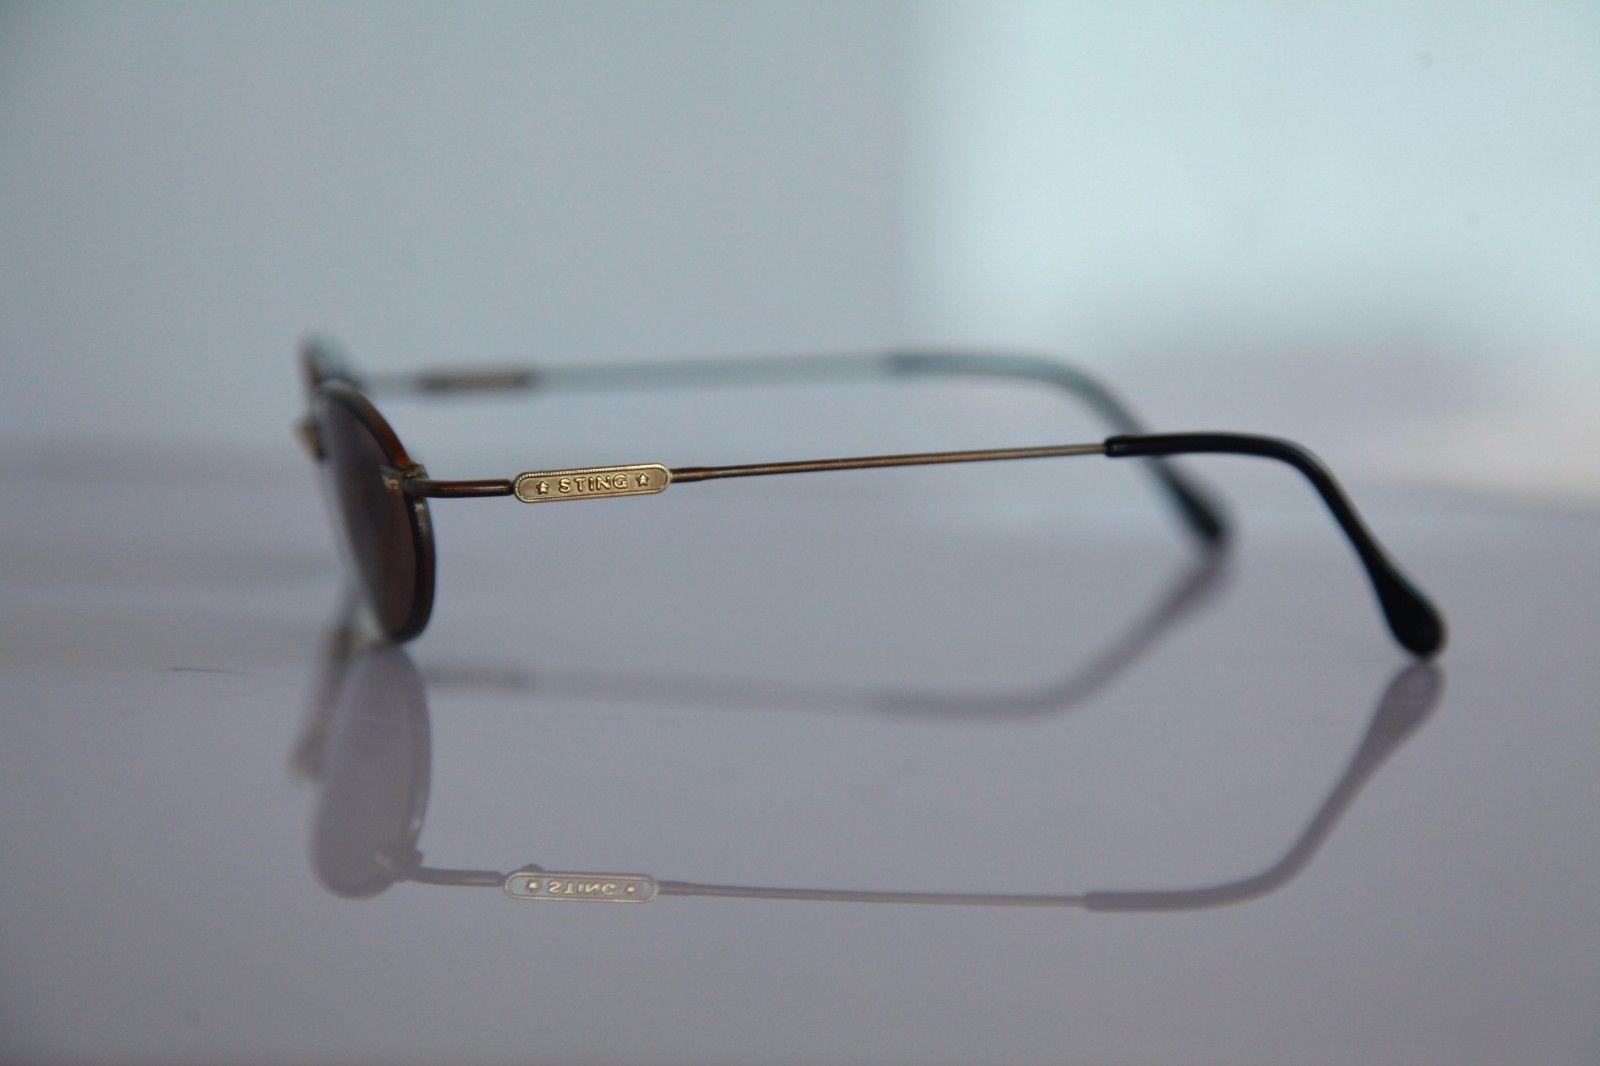 c7a0616d92c Sting Sunglasses Italy